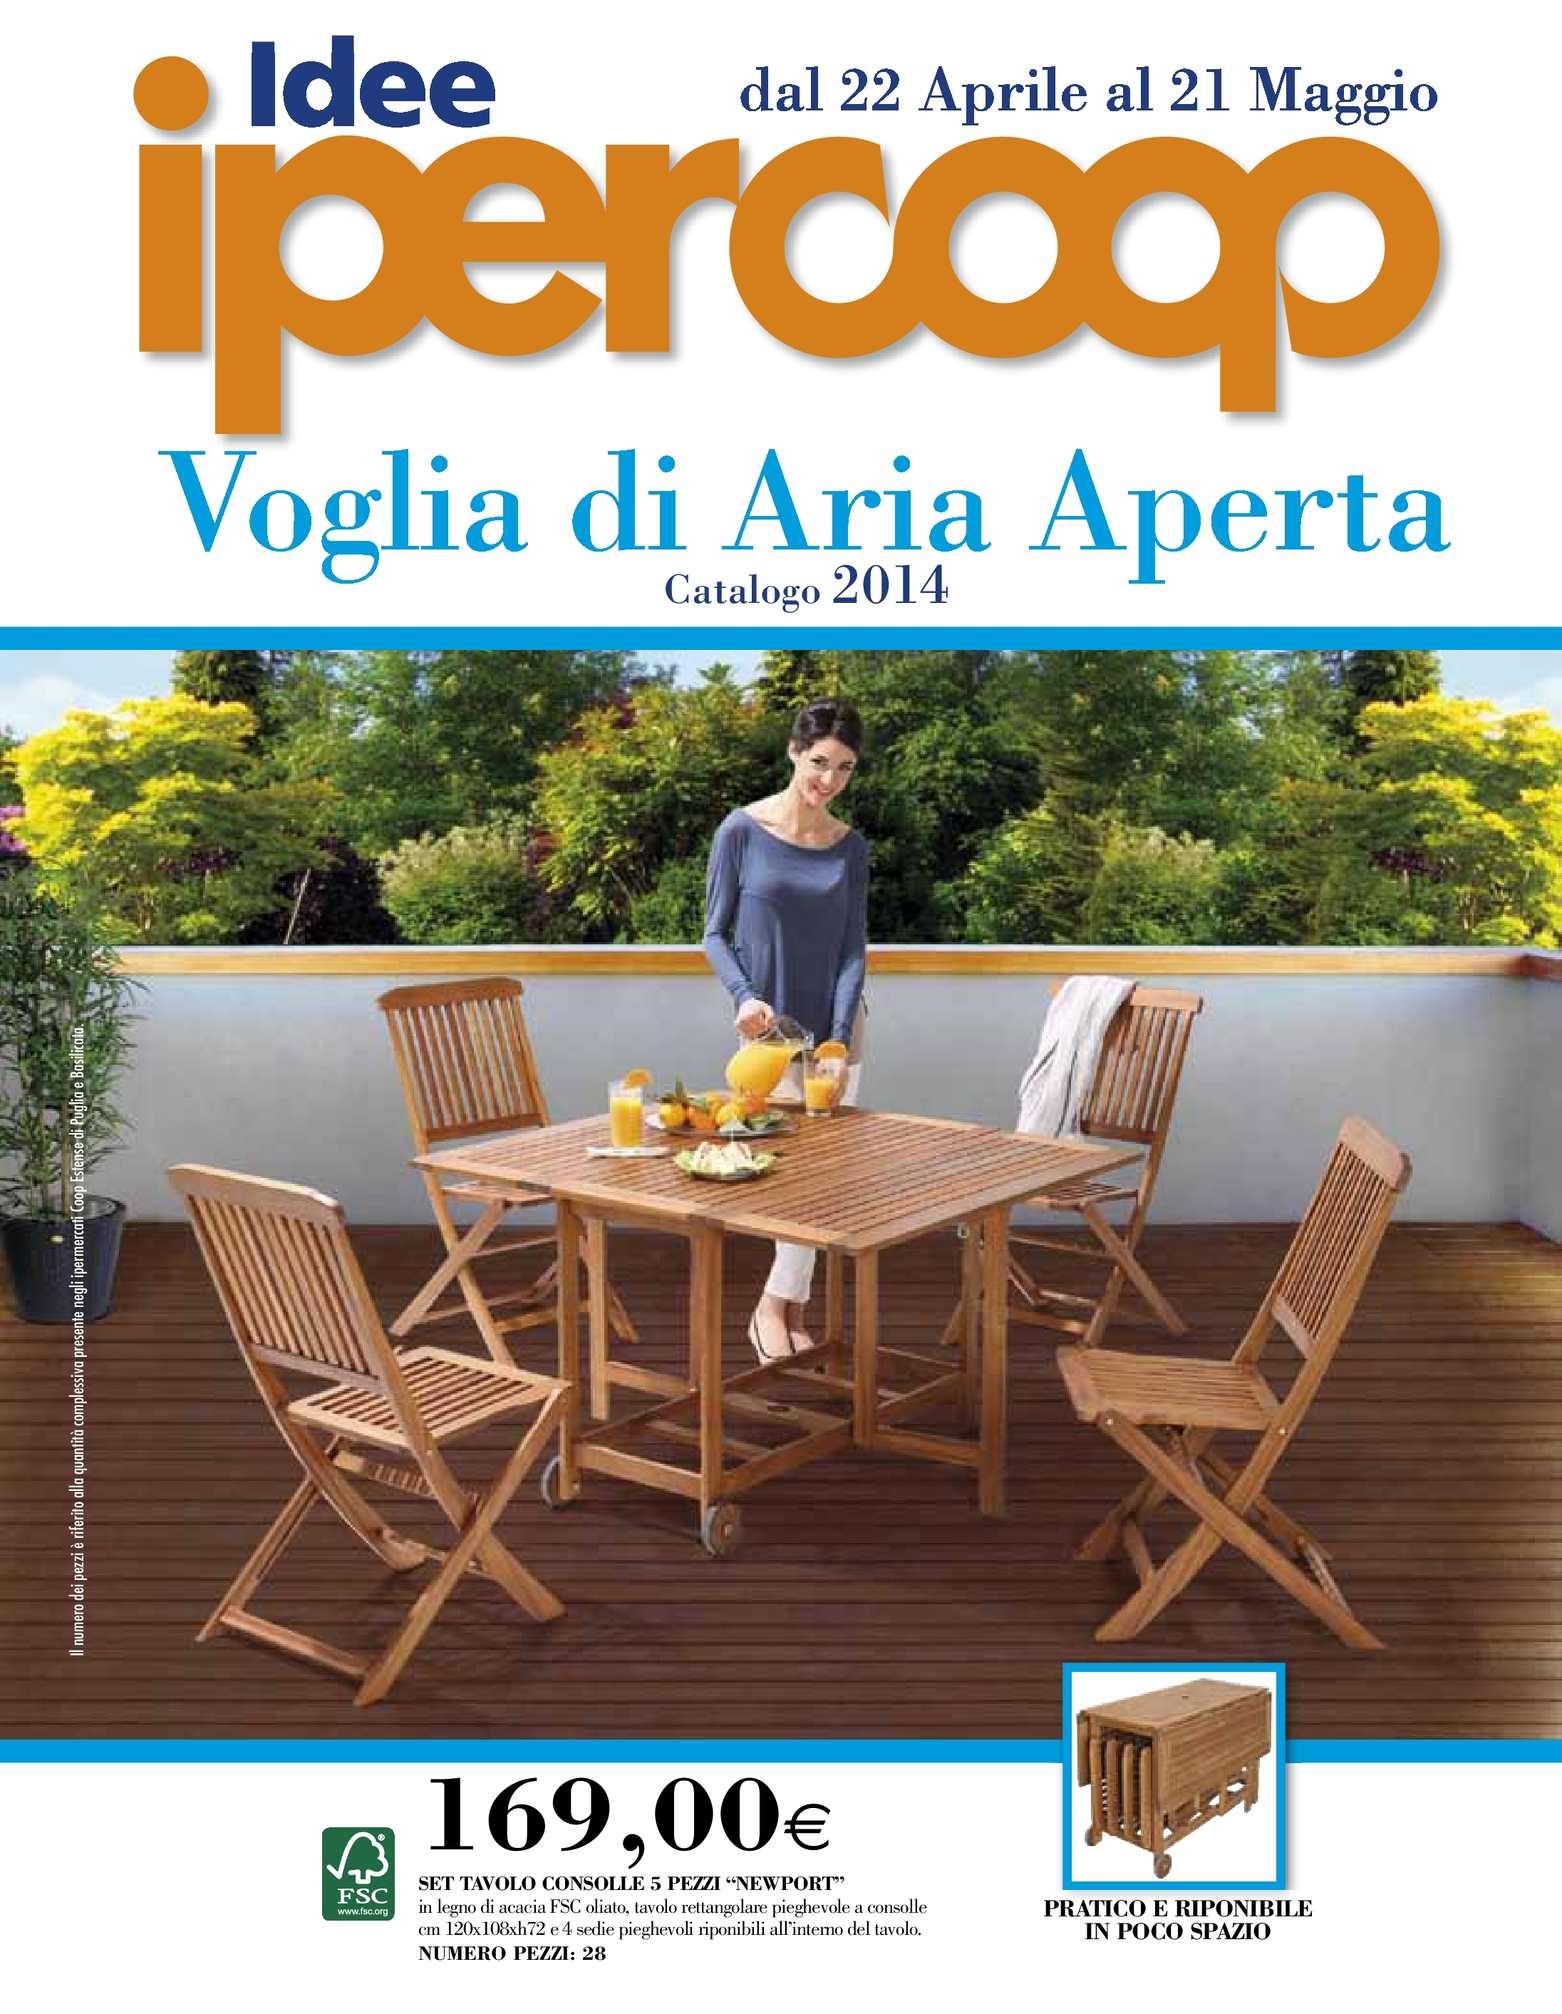 Divano Letto Ipercoop.Calameo Volantino Ipercoop Puglia Basilicata 22apr 21mag